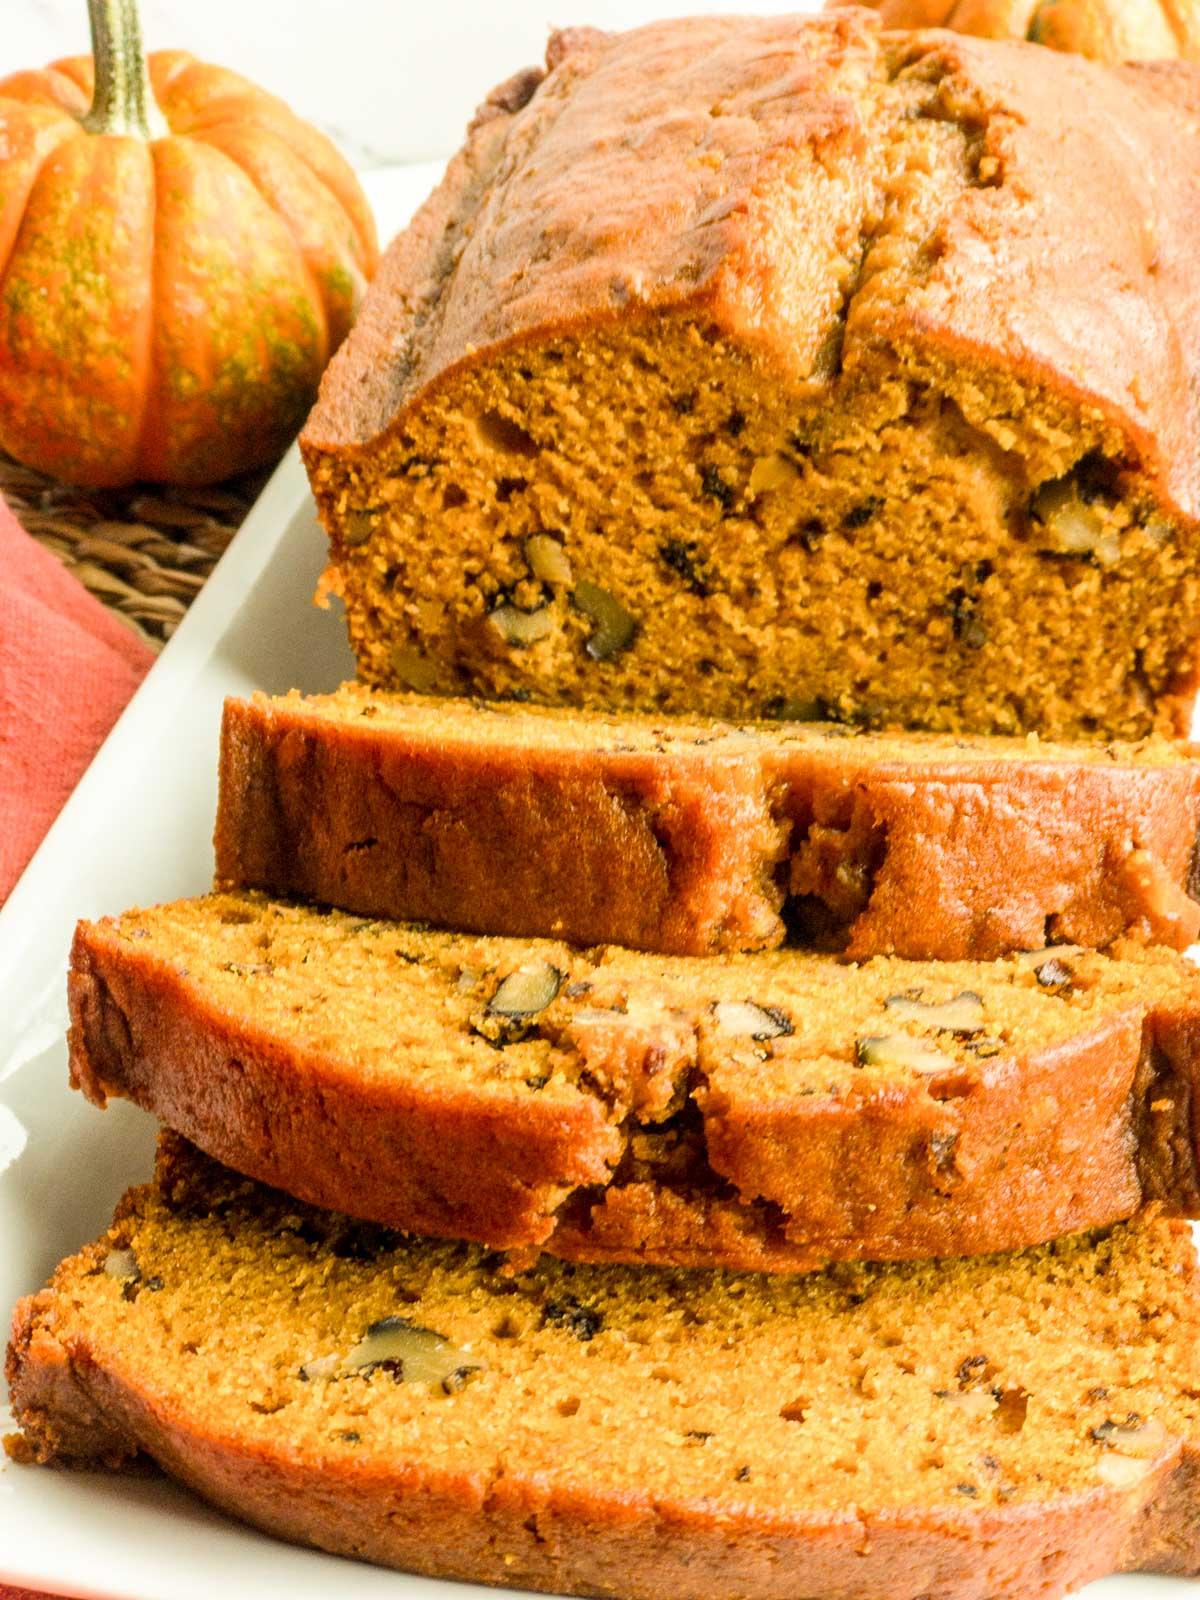 Sliced pumpkin bread on a white plate